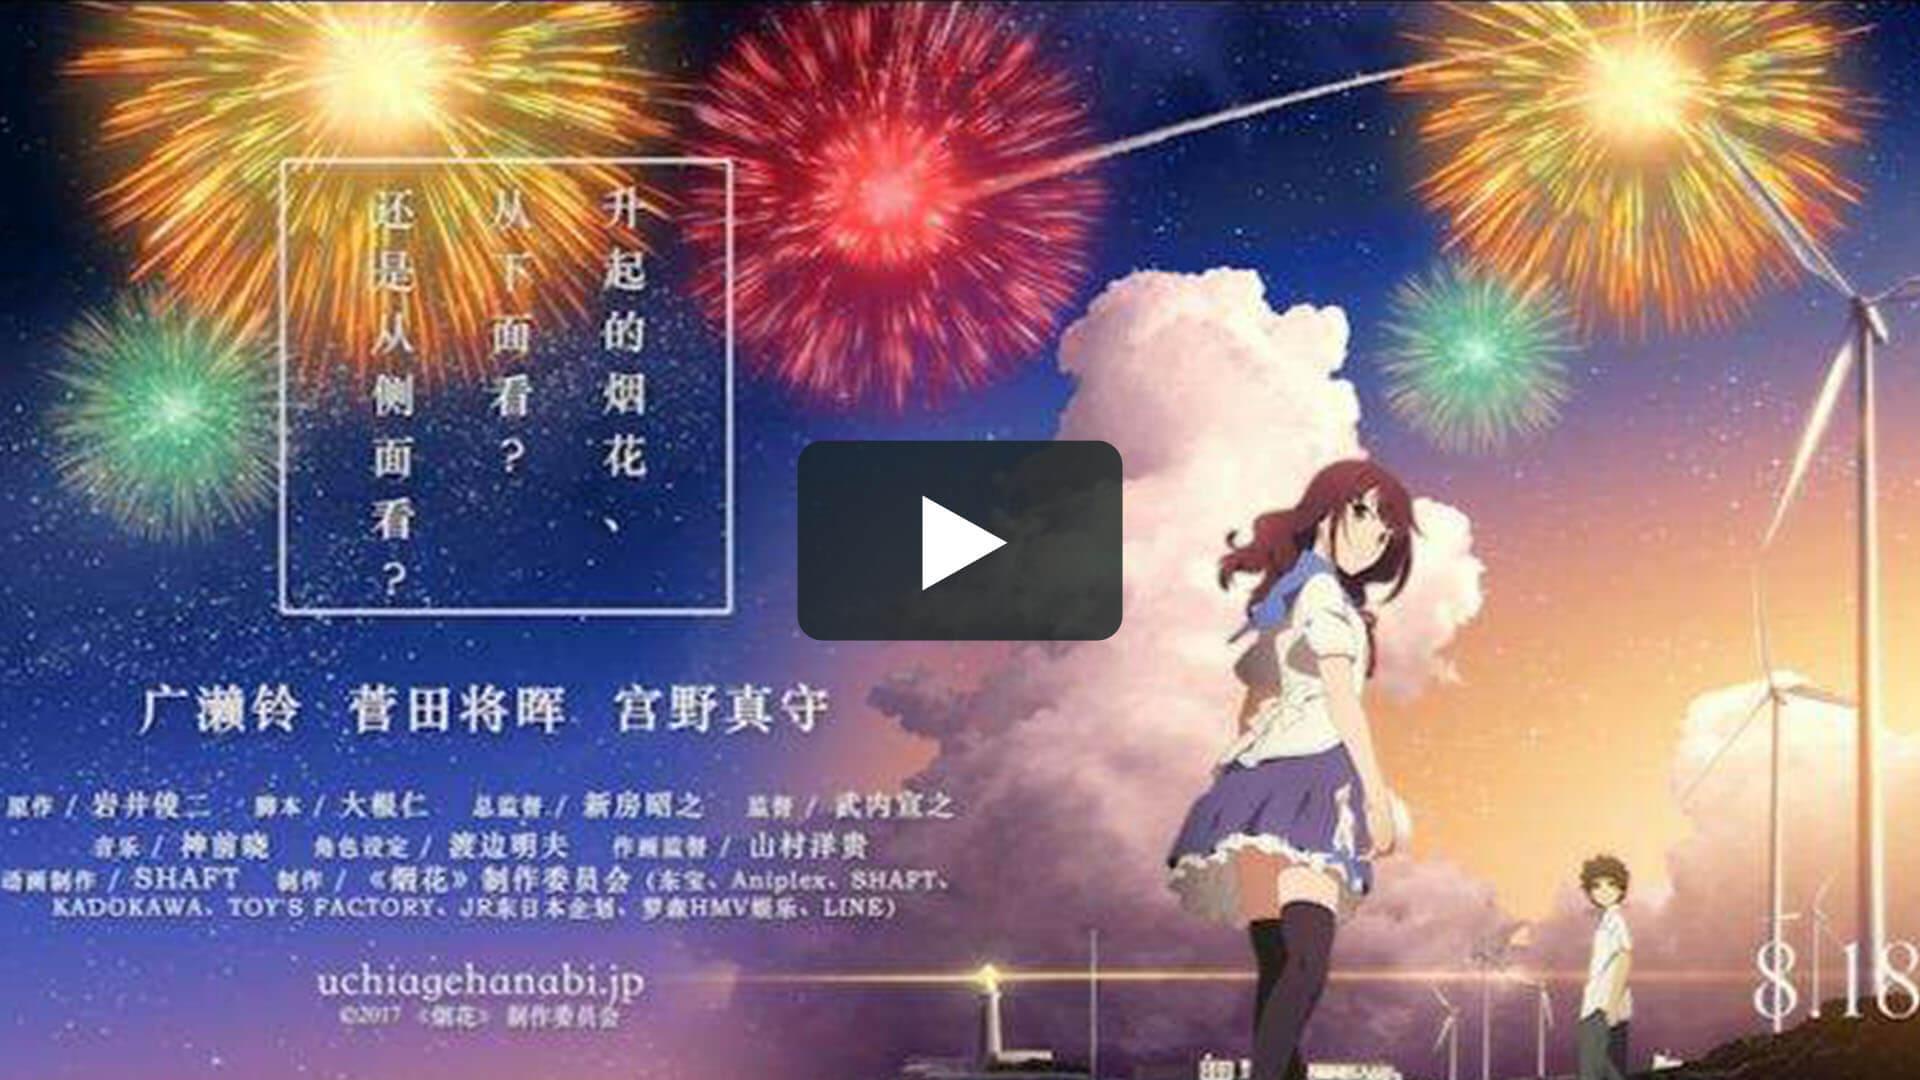 煙花-Fireworks